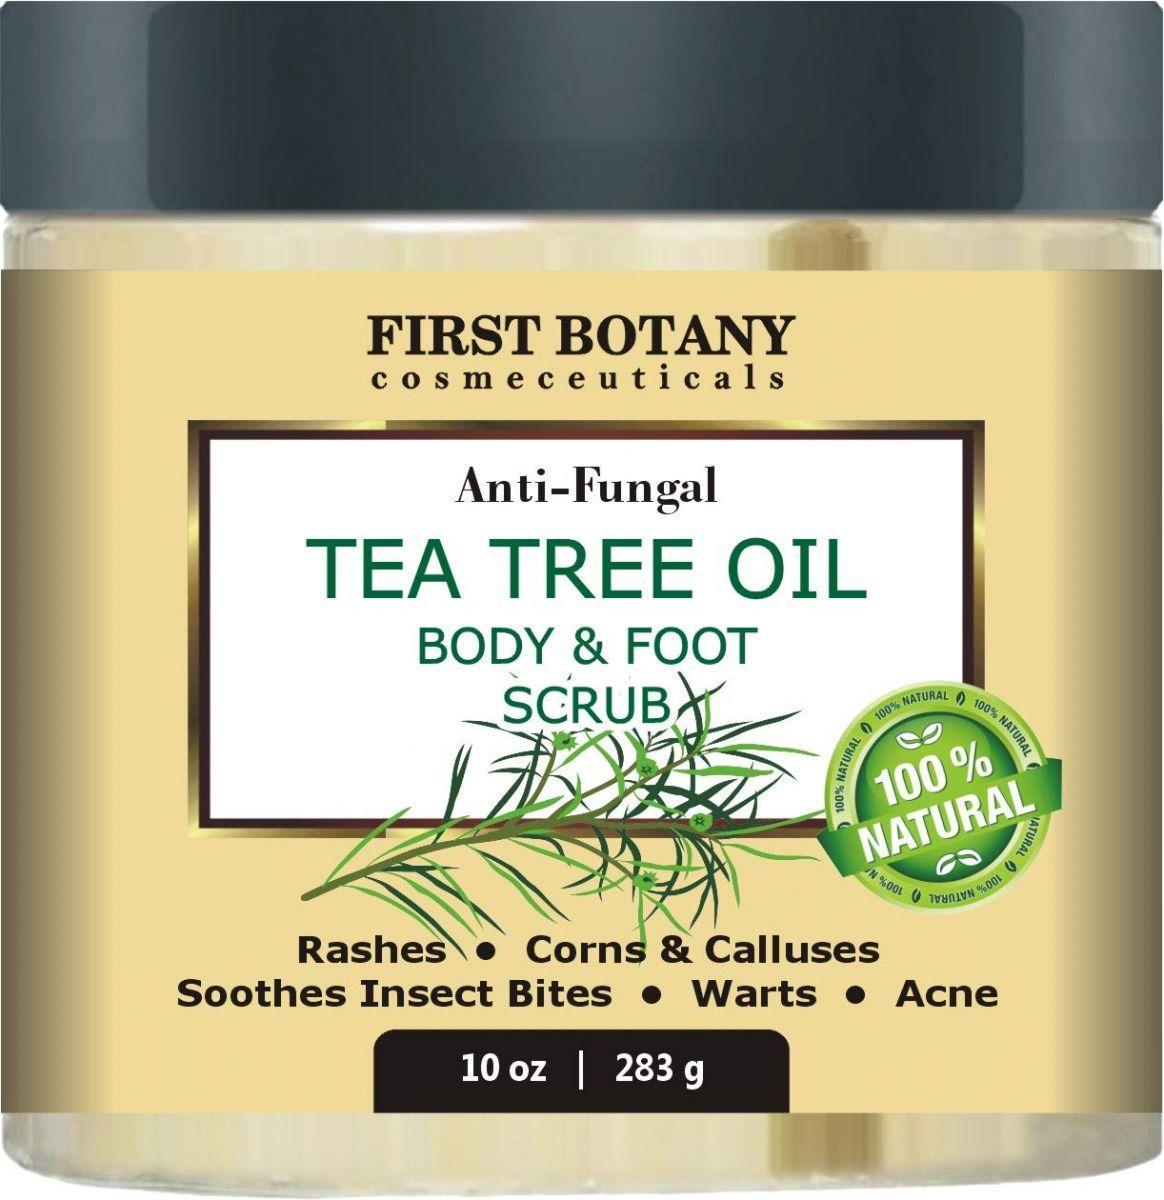 Anti-fungal tea tree oil body & foot scrub